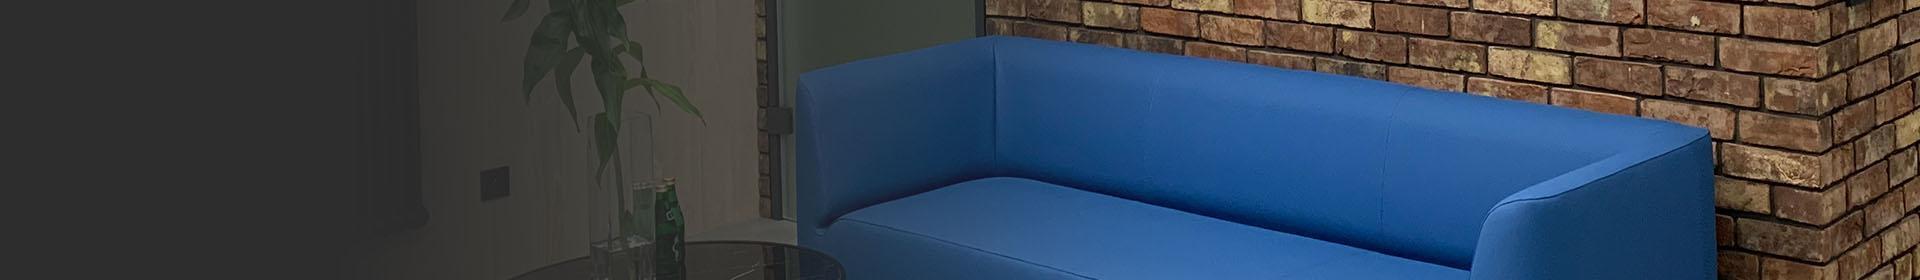 niebieska kanapa